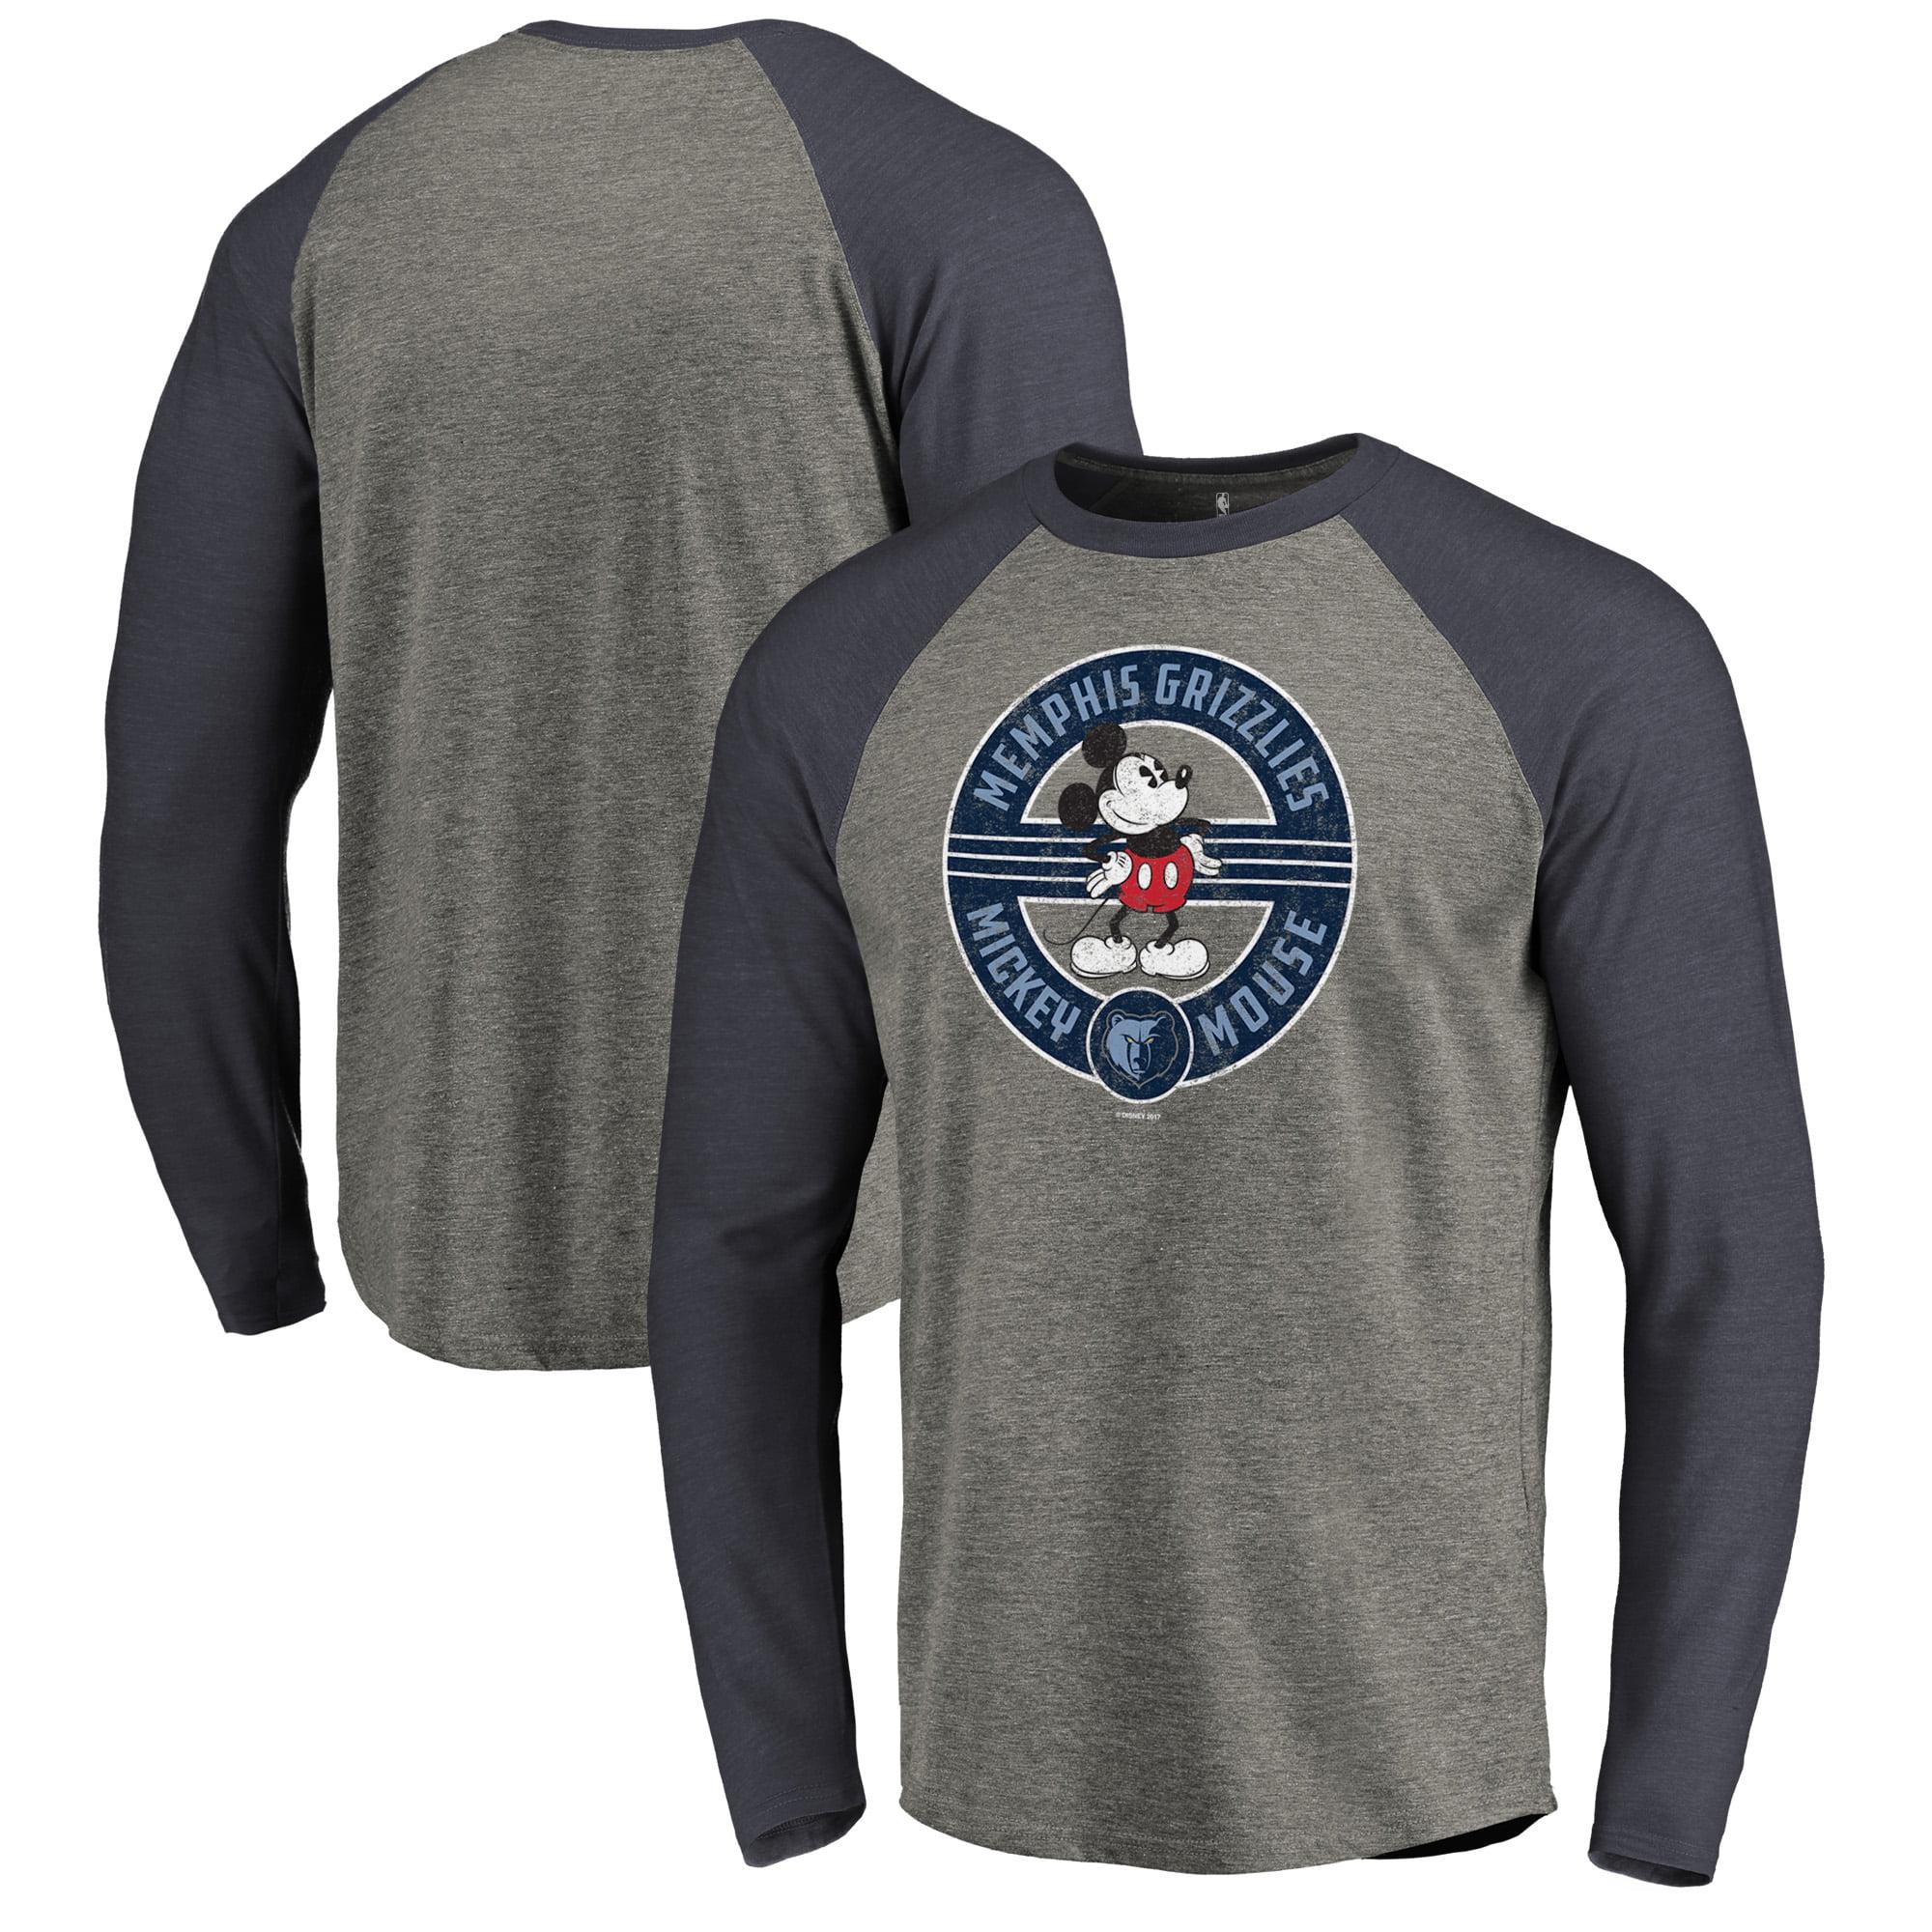 Memphis Grizzlies Fanatics Branded Disney Mickey's True Original Seal Raglan Tri-Blend Long Sleeve T-Shirt - Heathered Gray/Navy